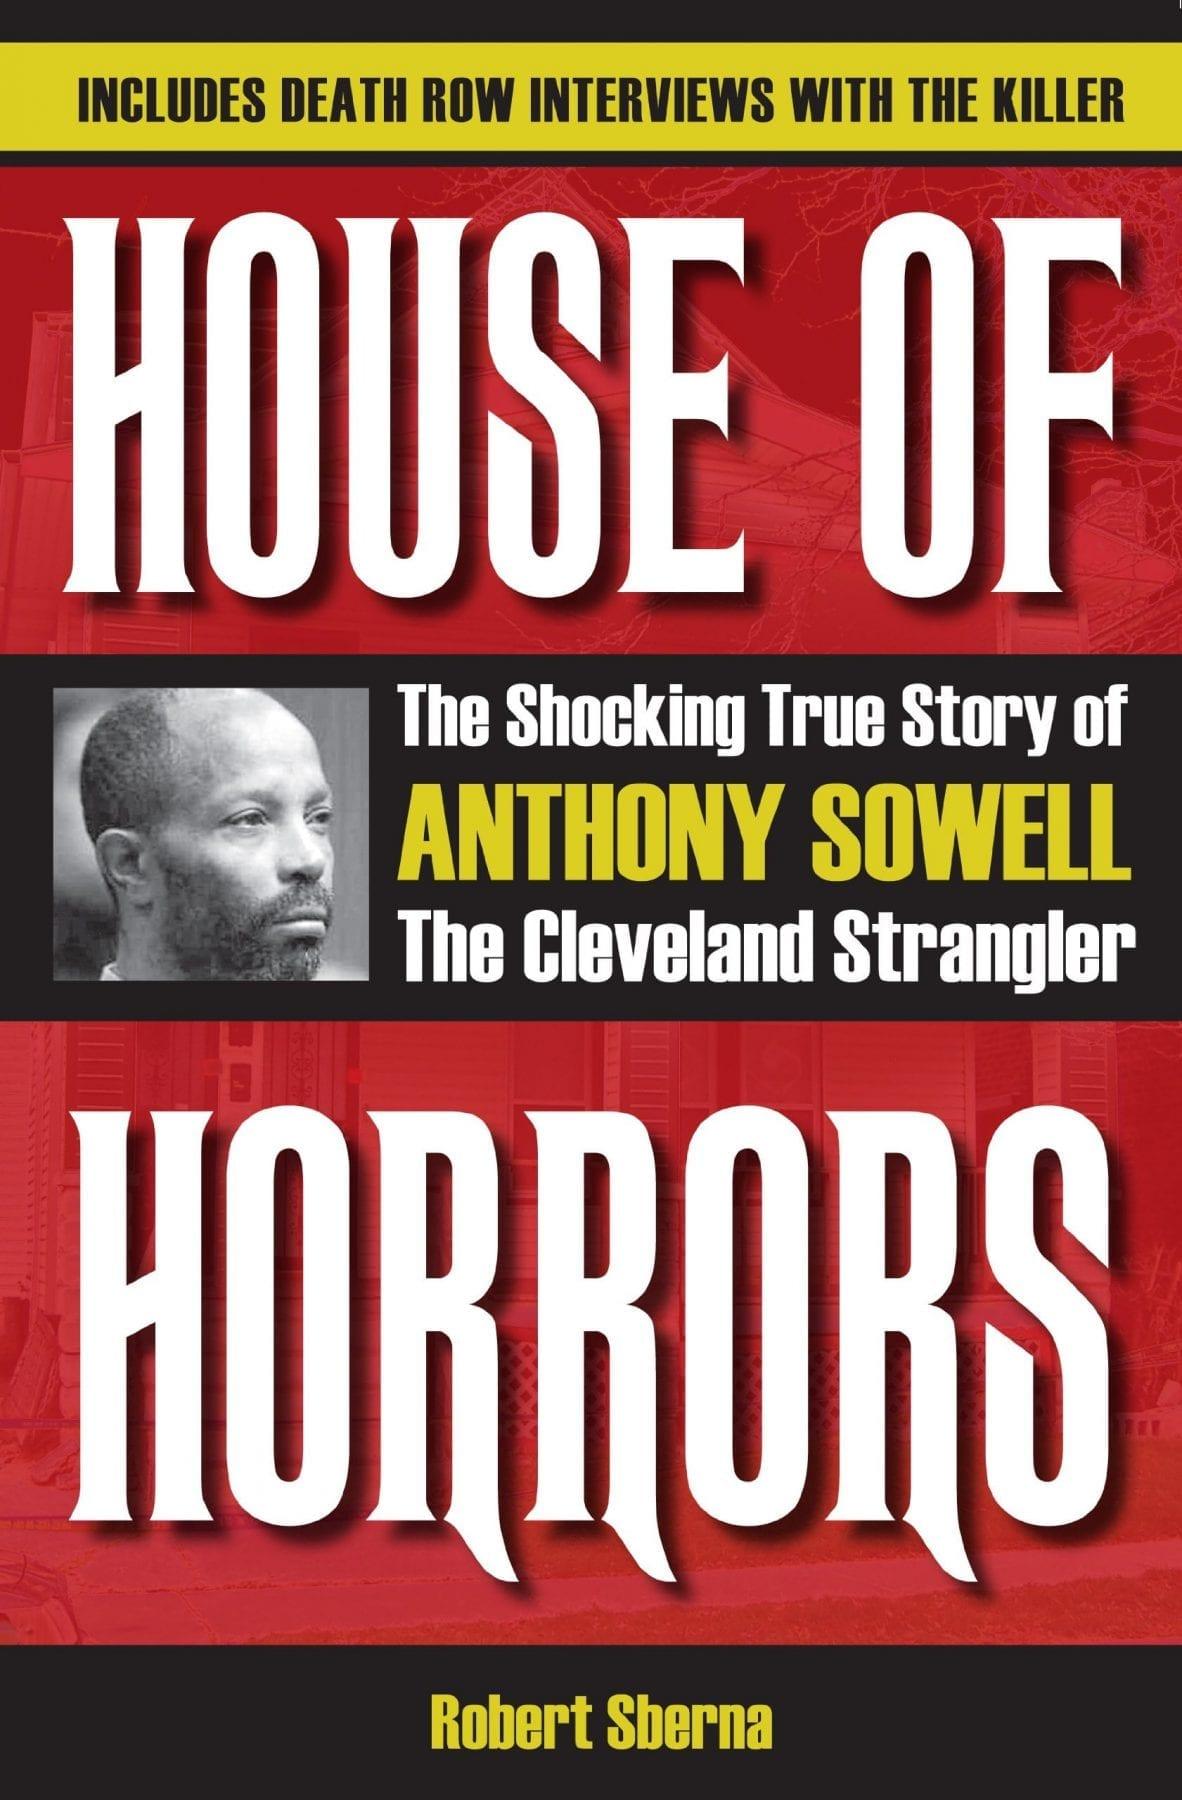 House Of Horrors by Robert Sberna